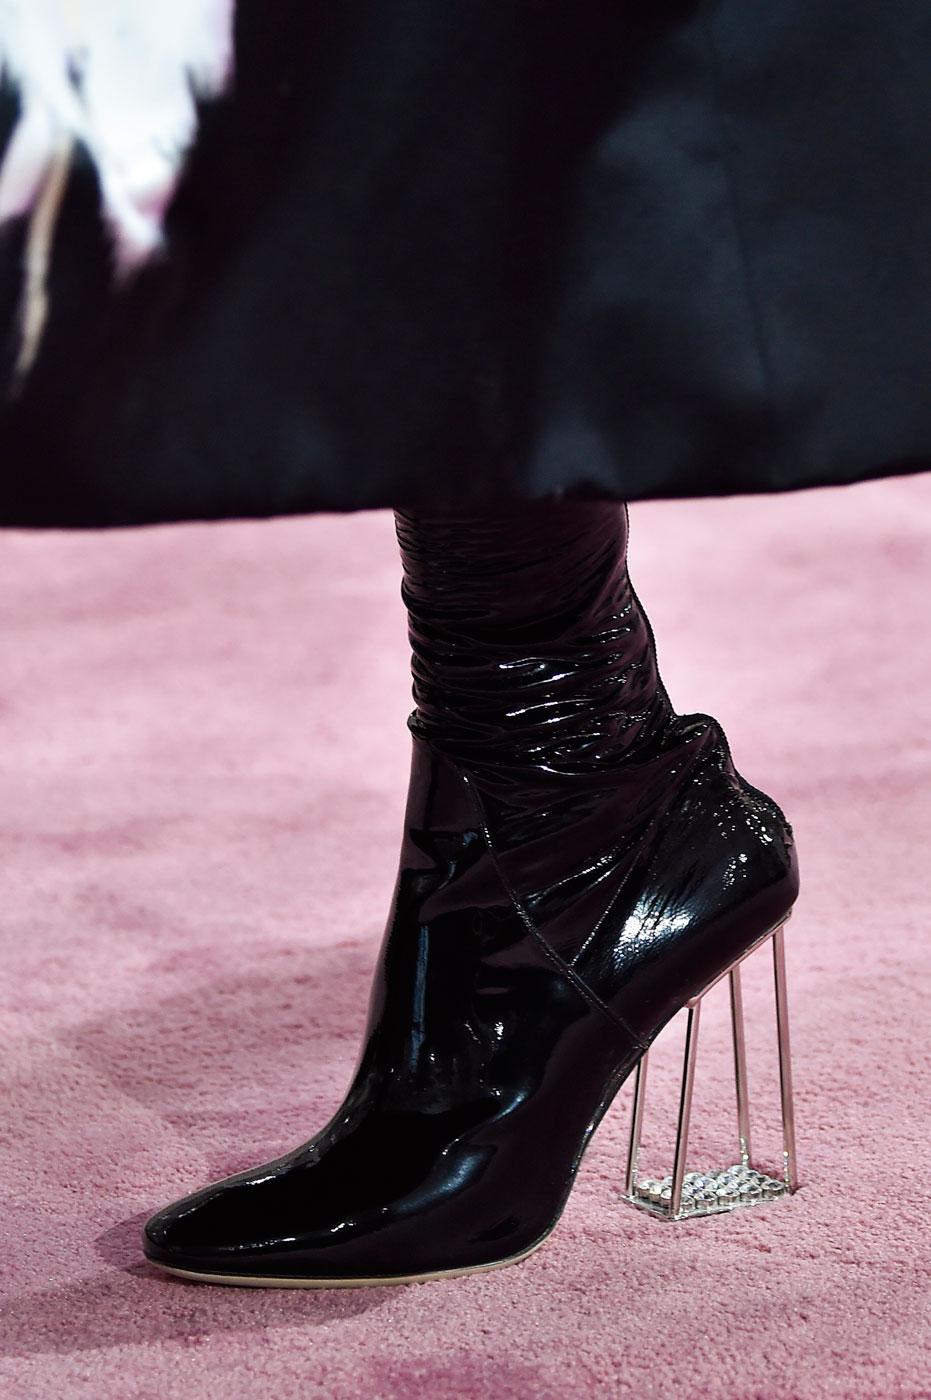 Christian-Dior-fashion-runway-show-close-ups-haute-couture-paris-spring-summer-2015-the-impression-159